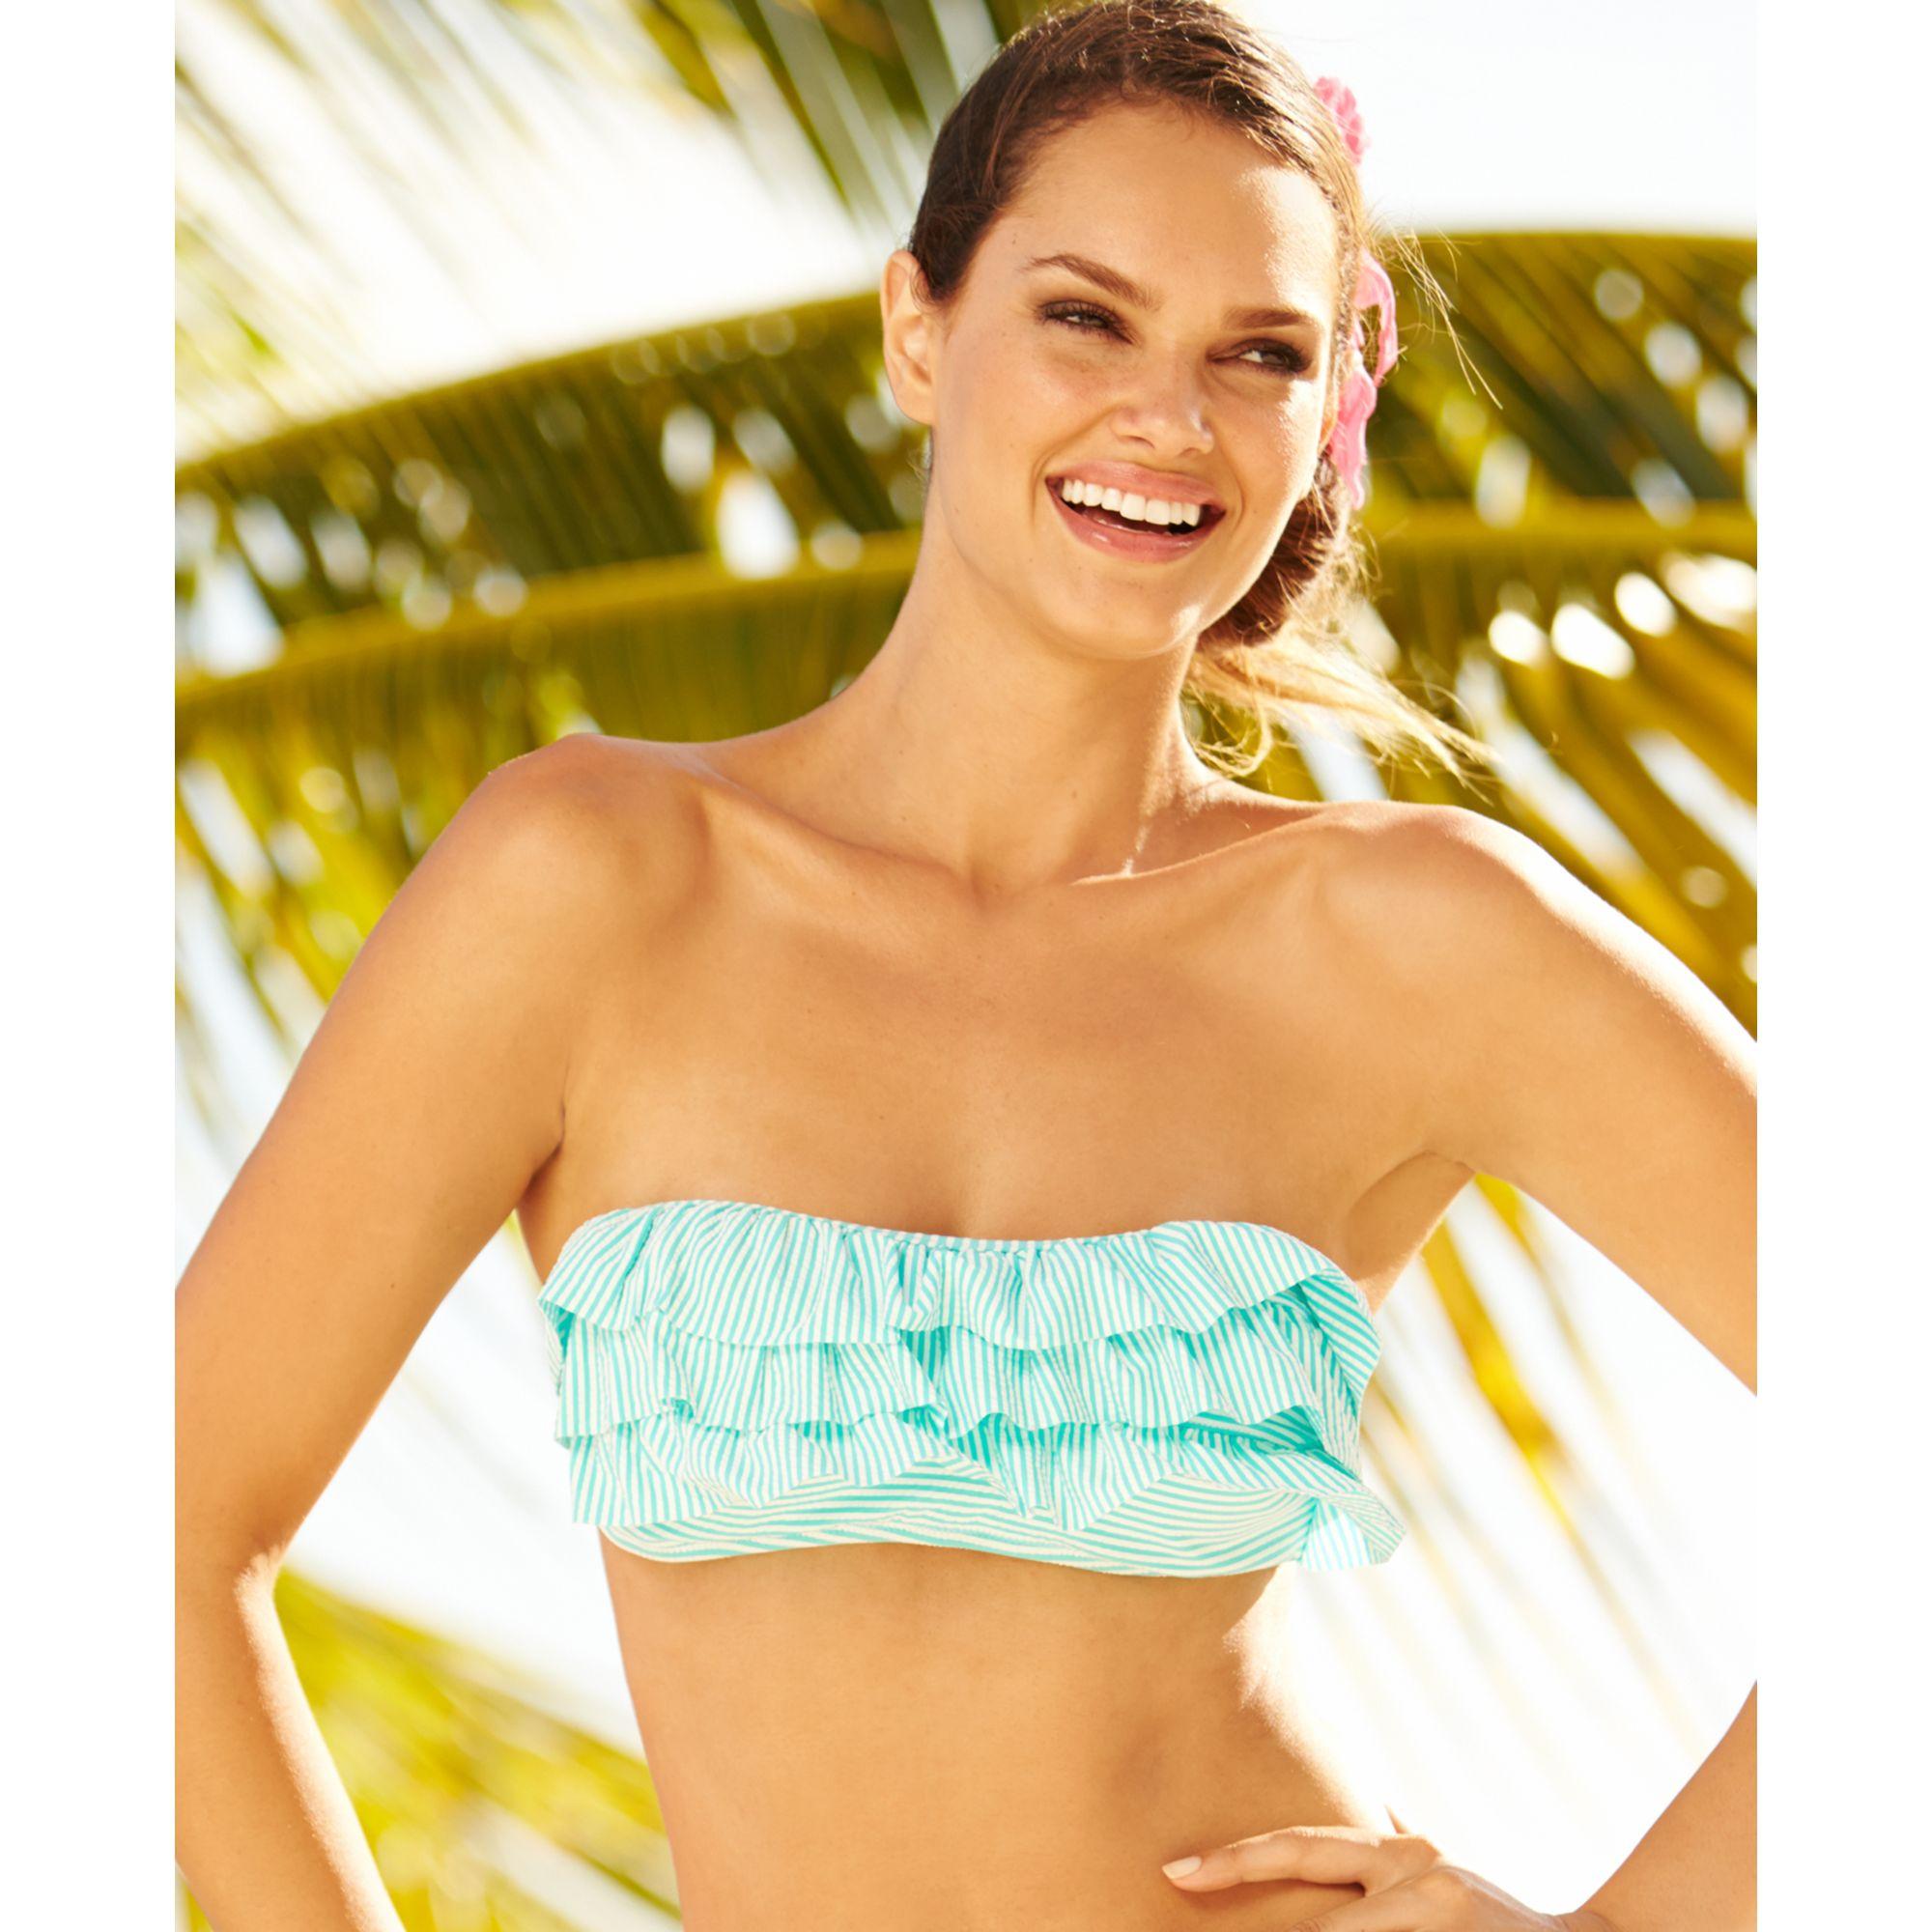 4089af3af93679 Lyst - Jessica Simpson Seersucker Ruffle Bandeau Bikini Top in Blue